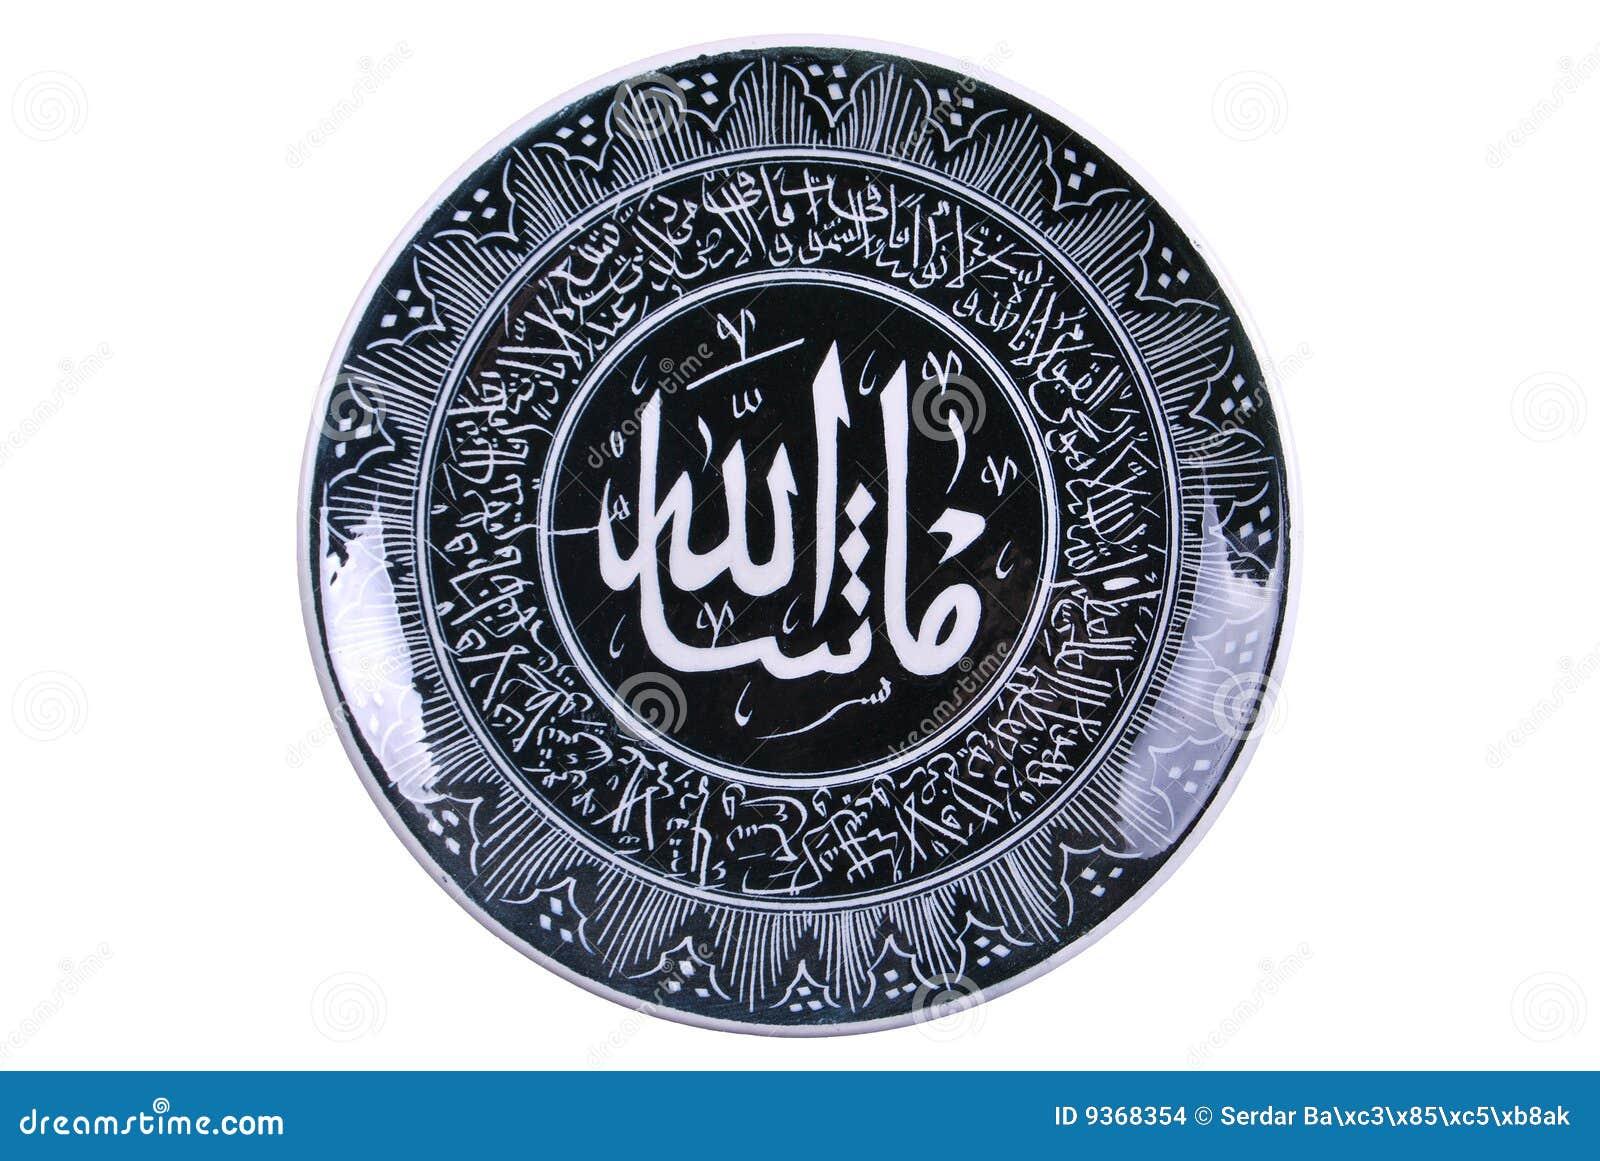 36 Meaning Of Islam Dreams Dreams Meaning Of Islam